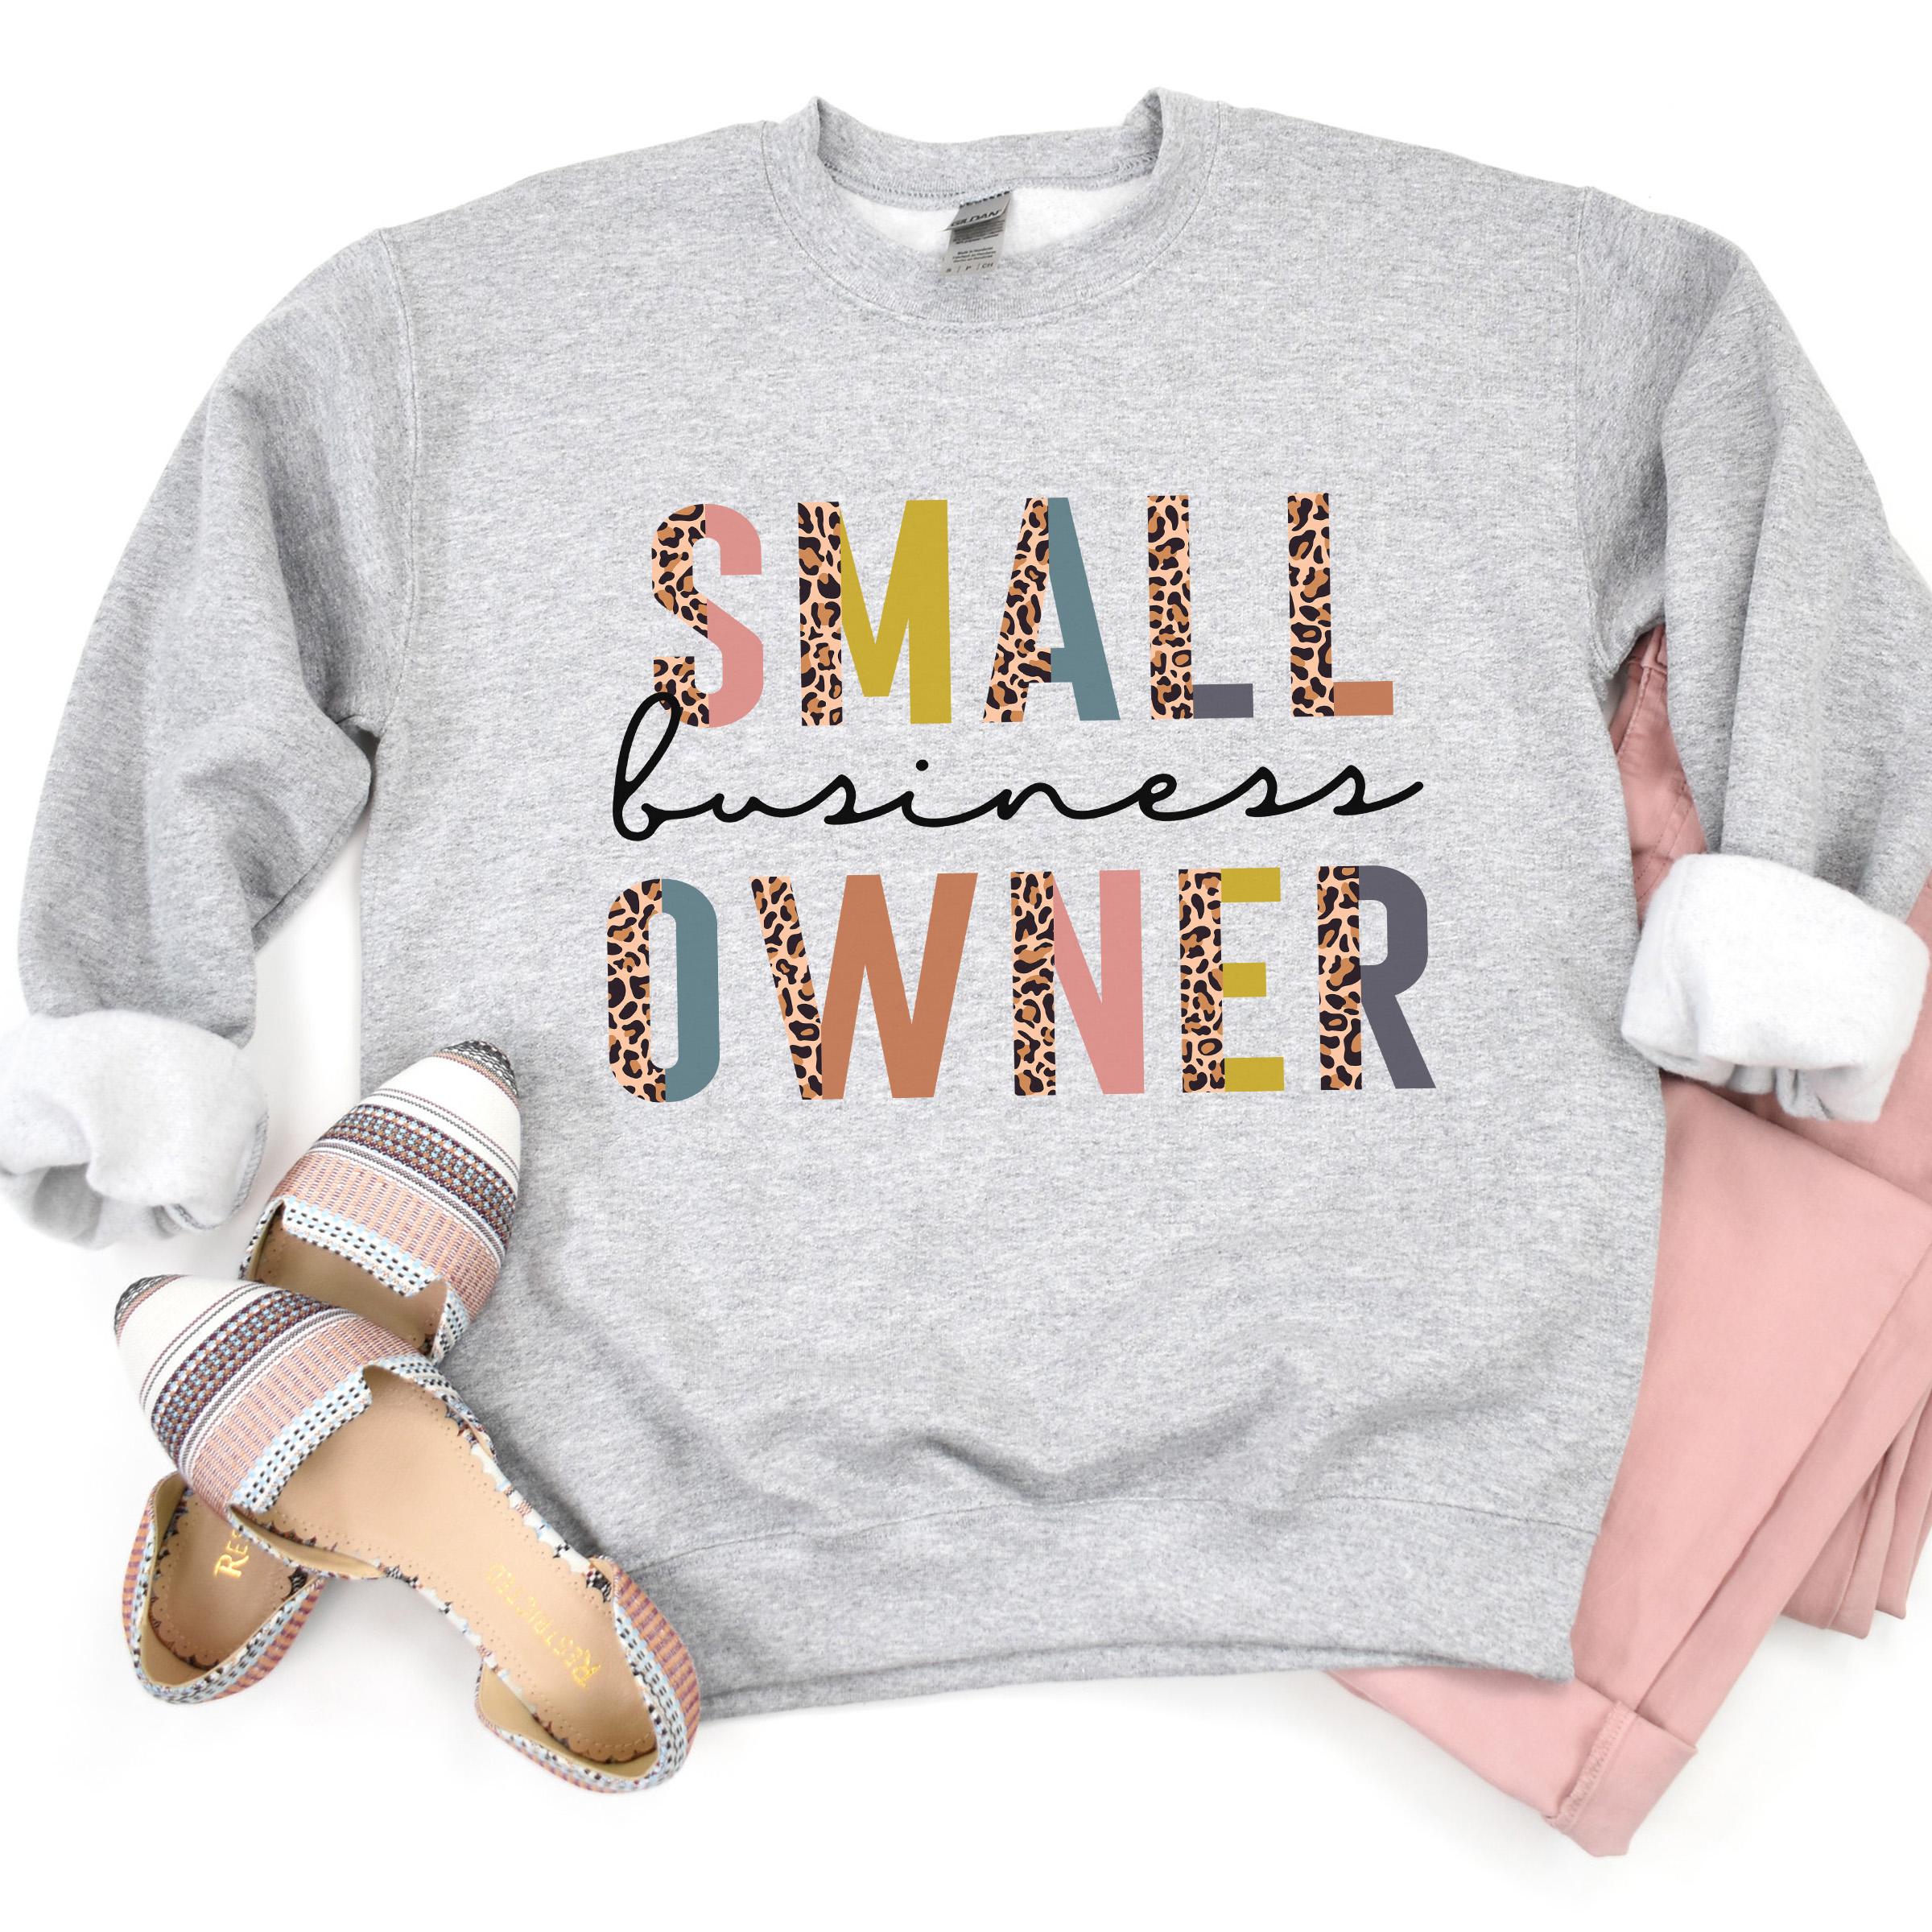 Small Business Owner Sweatshirt